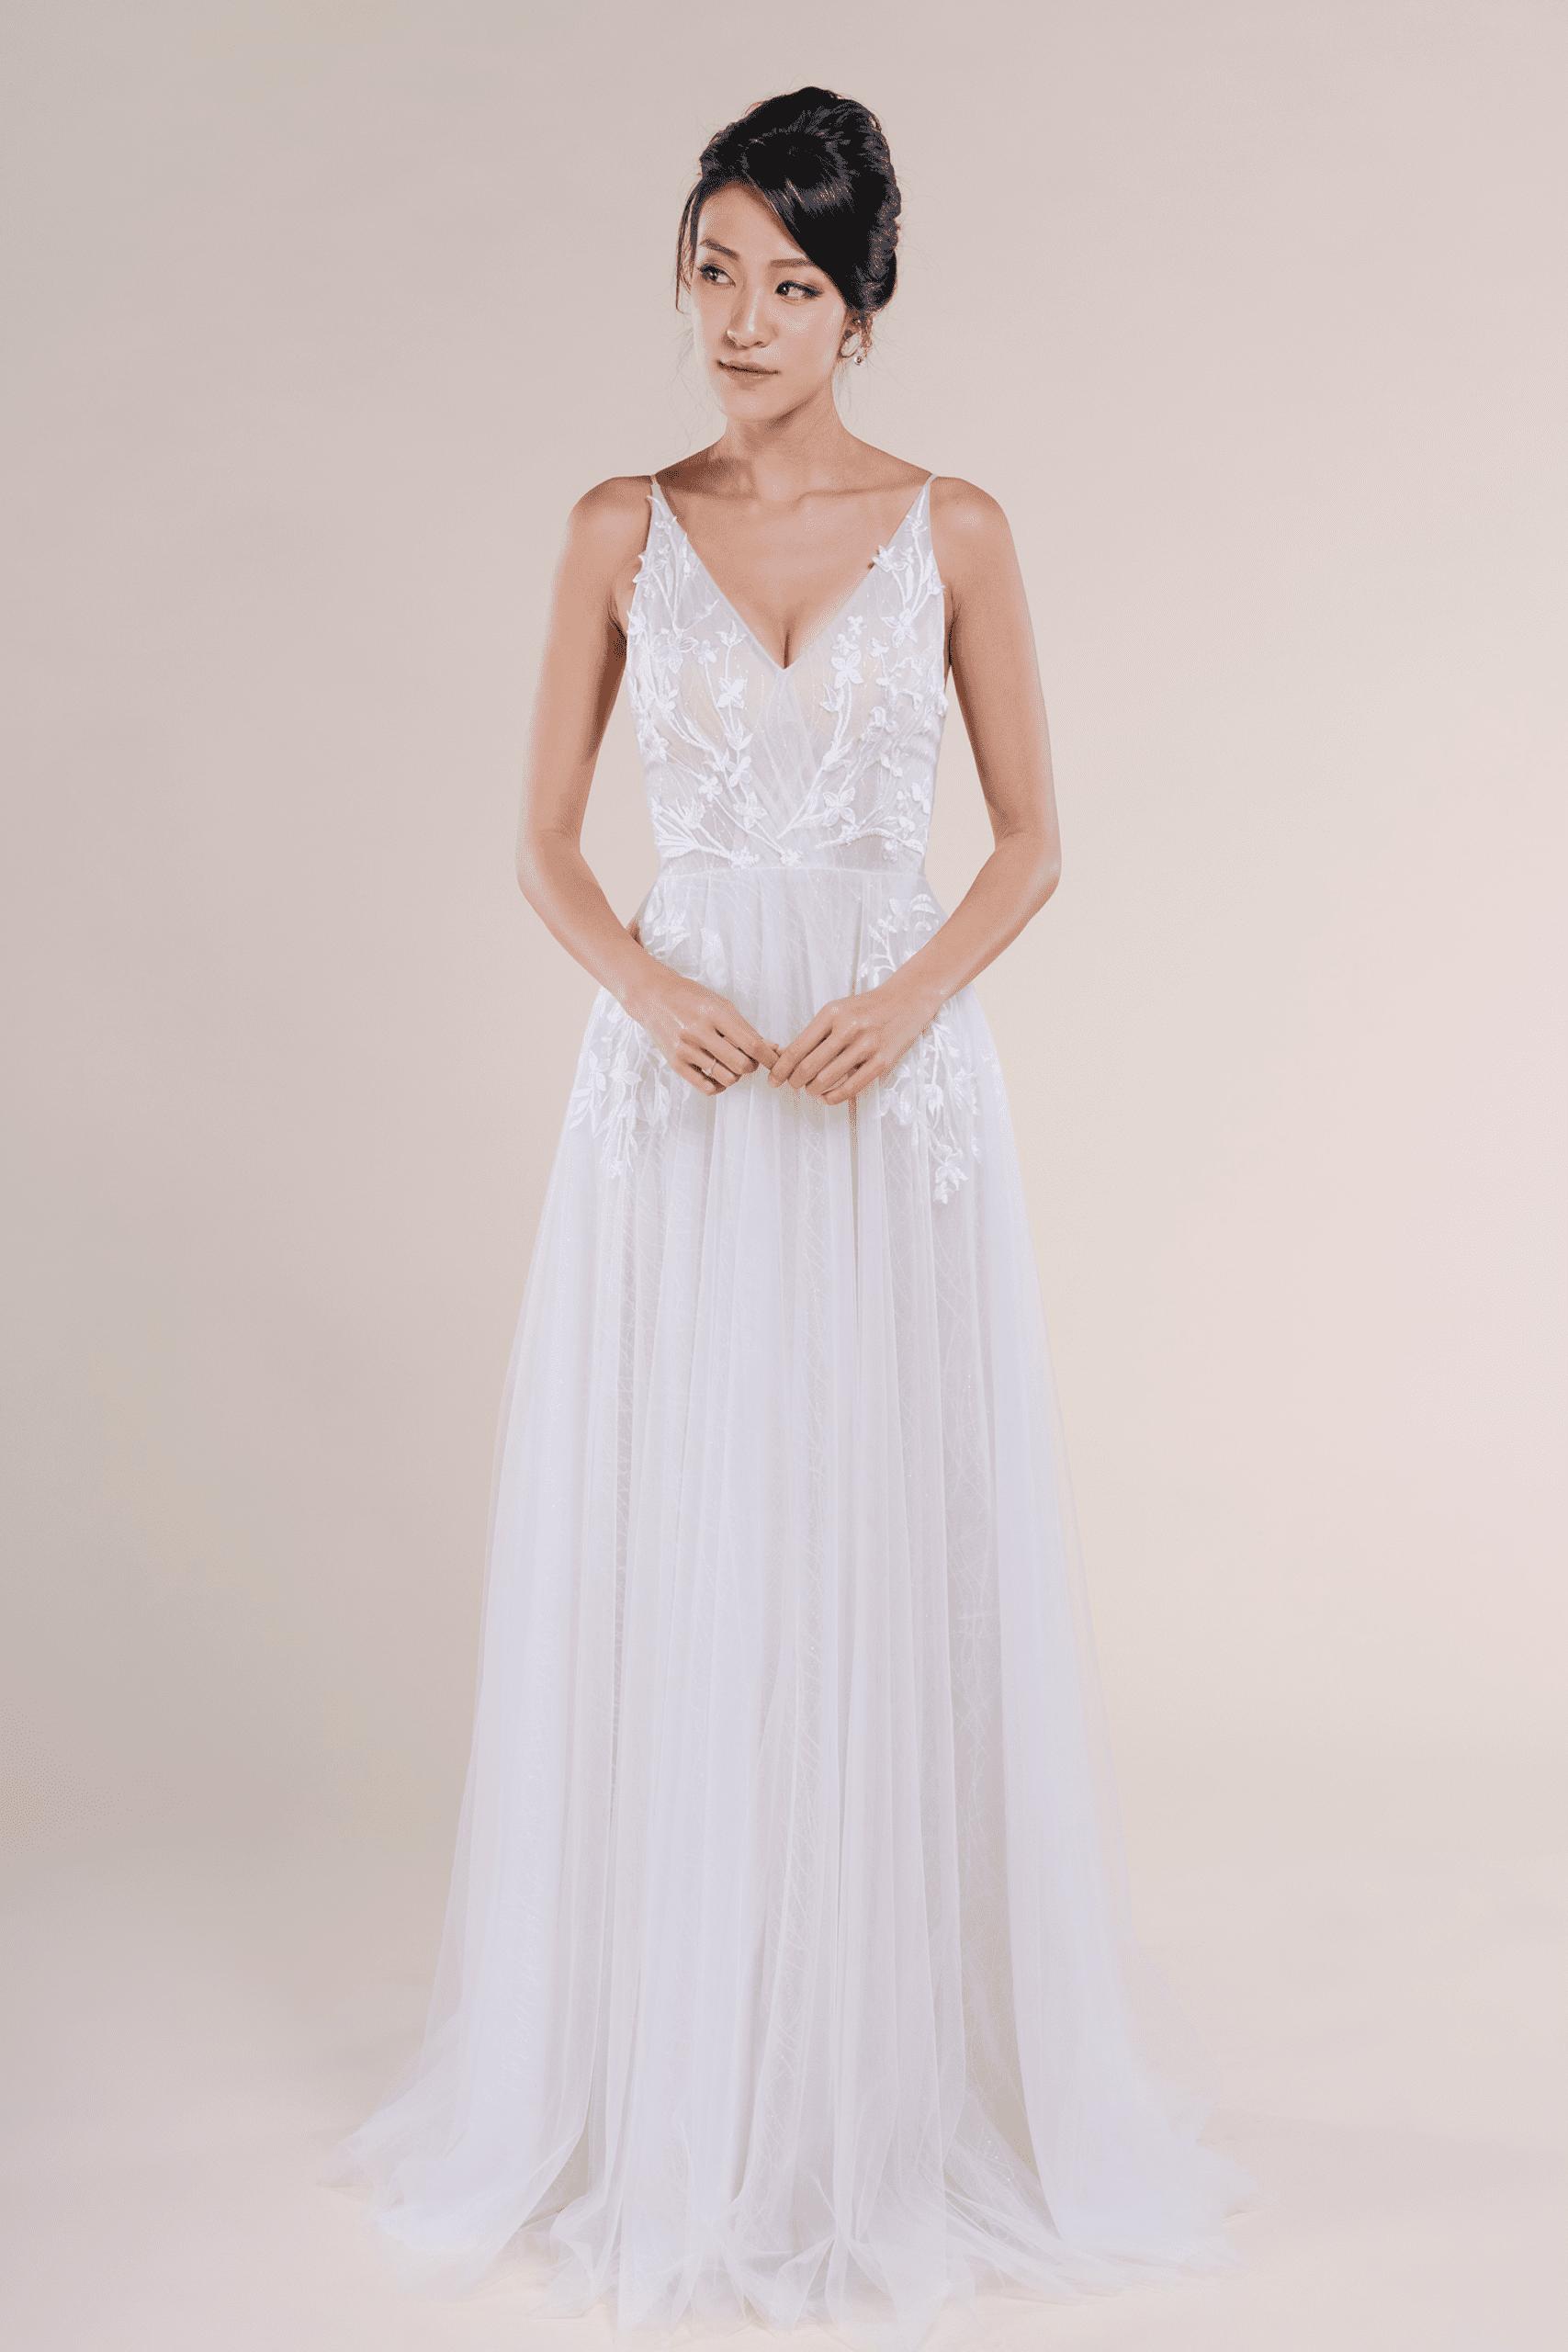 Paige-Local-Designer-Gown